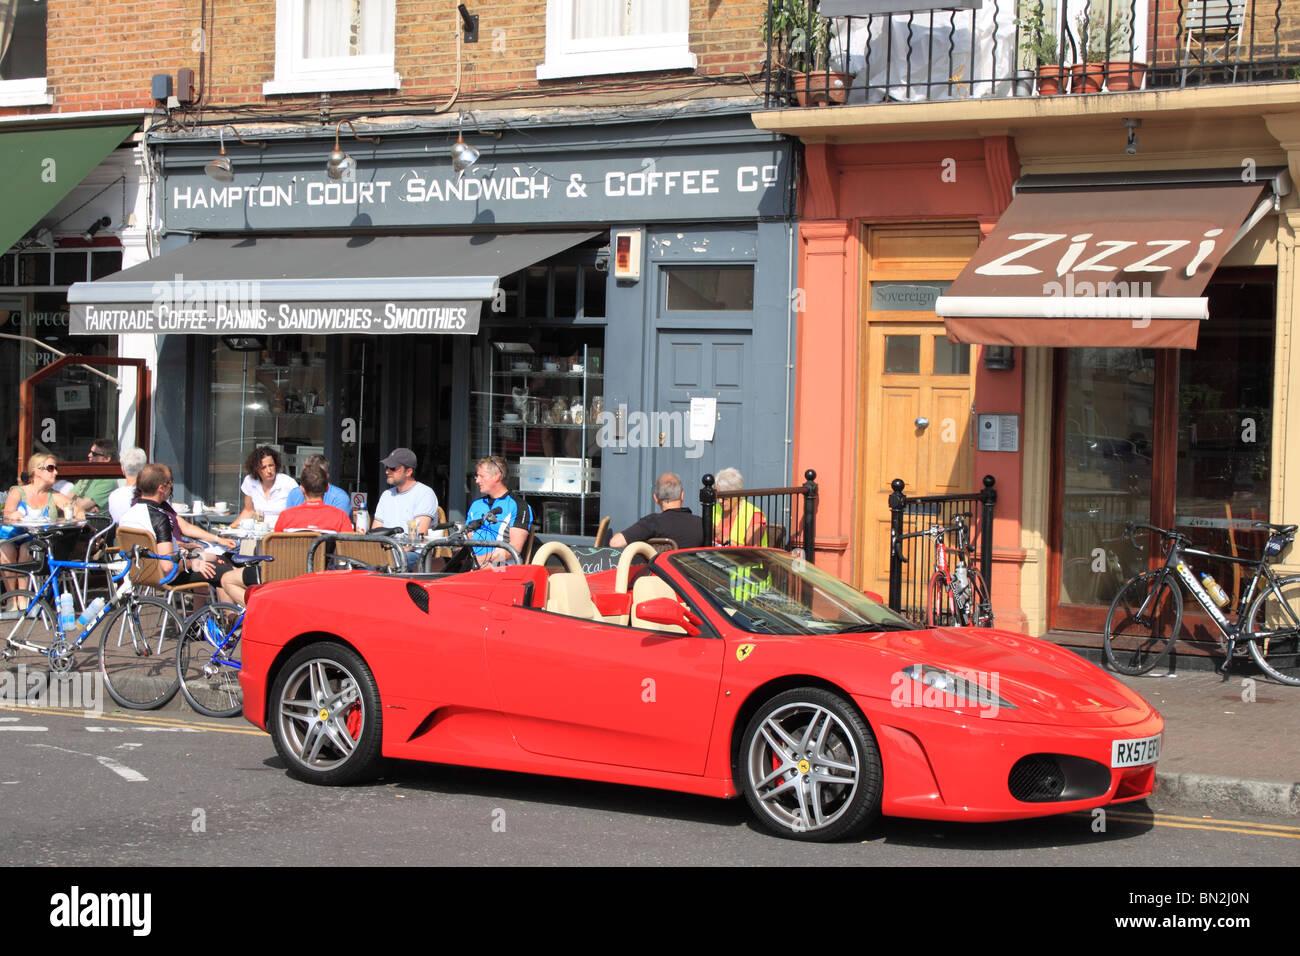 Ferrari F430 Spider in Bridge Road, Hampton Court, East Molesey, Surrey, England, Great Britain, United Kingdom, - Stock Image